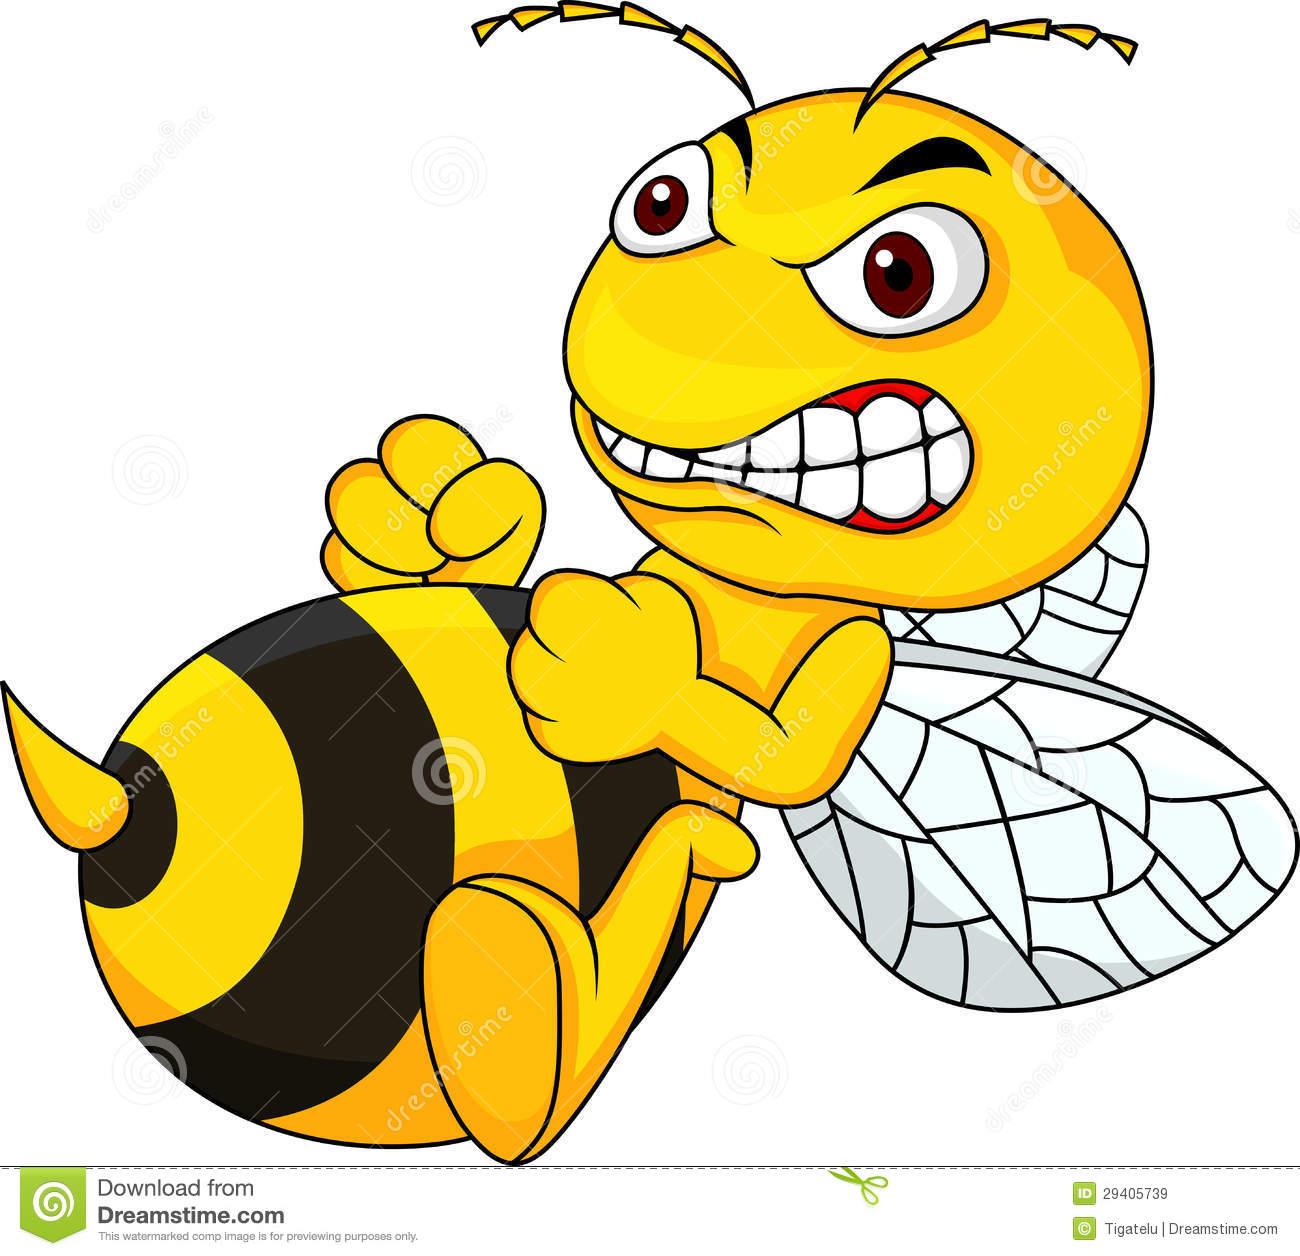 angry bumblebee cartoon - photo #1